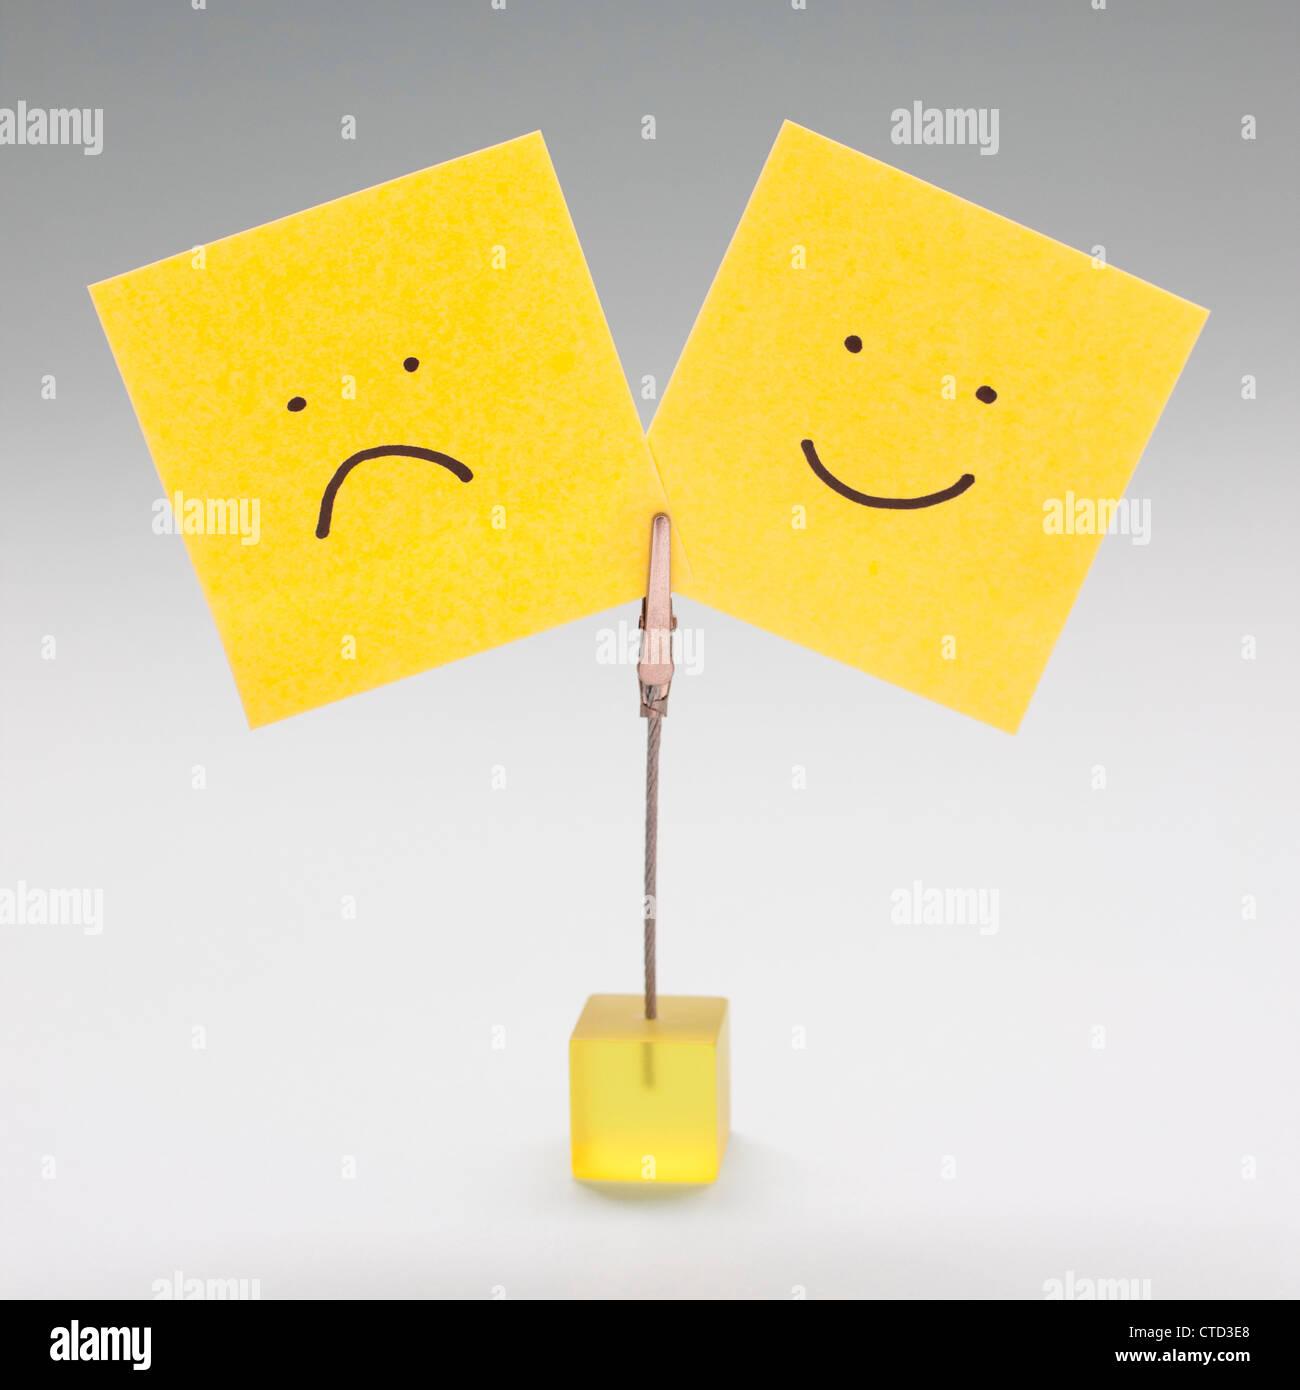 Moods  conceptual image - Stock Image